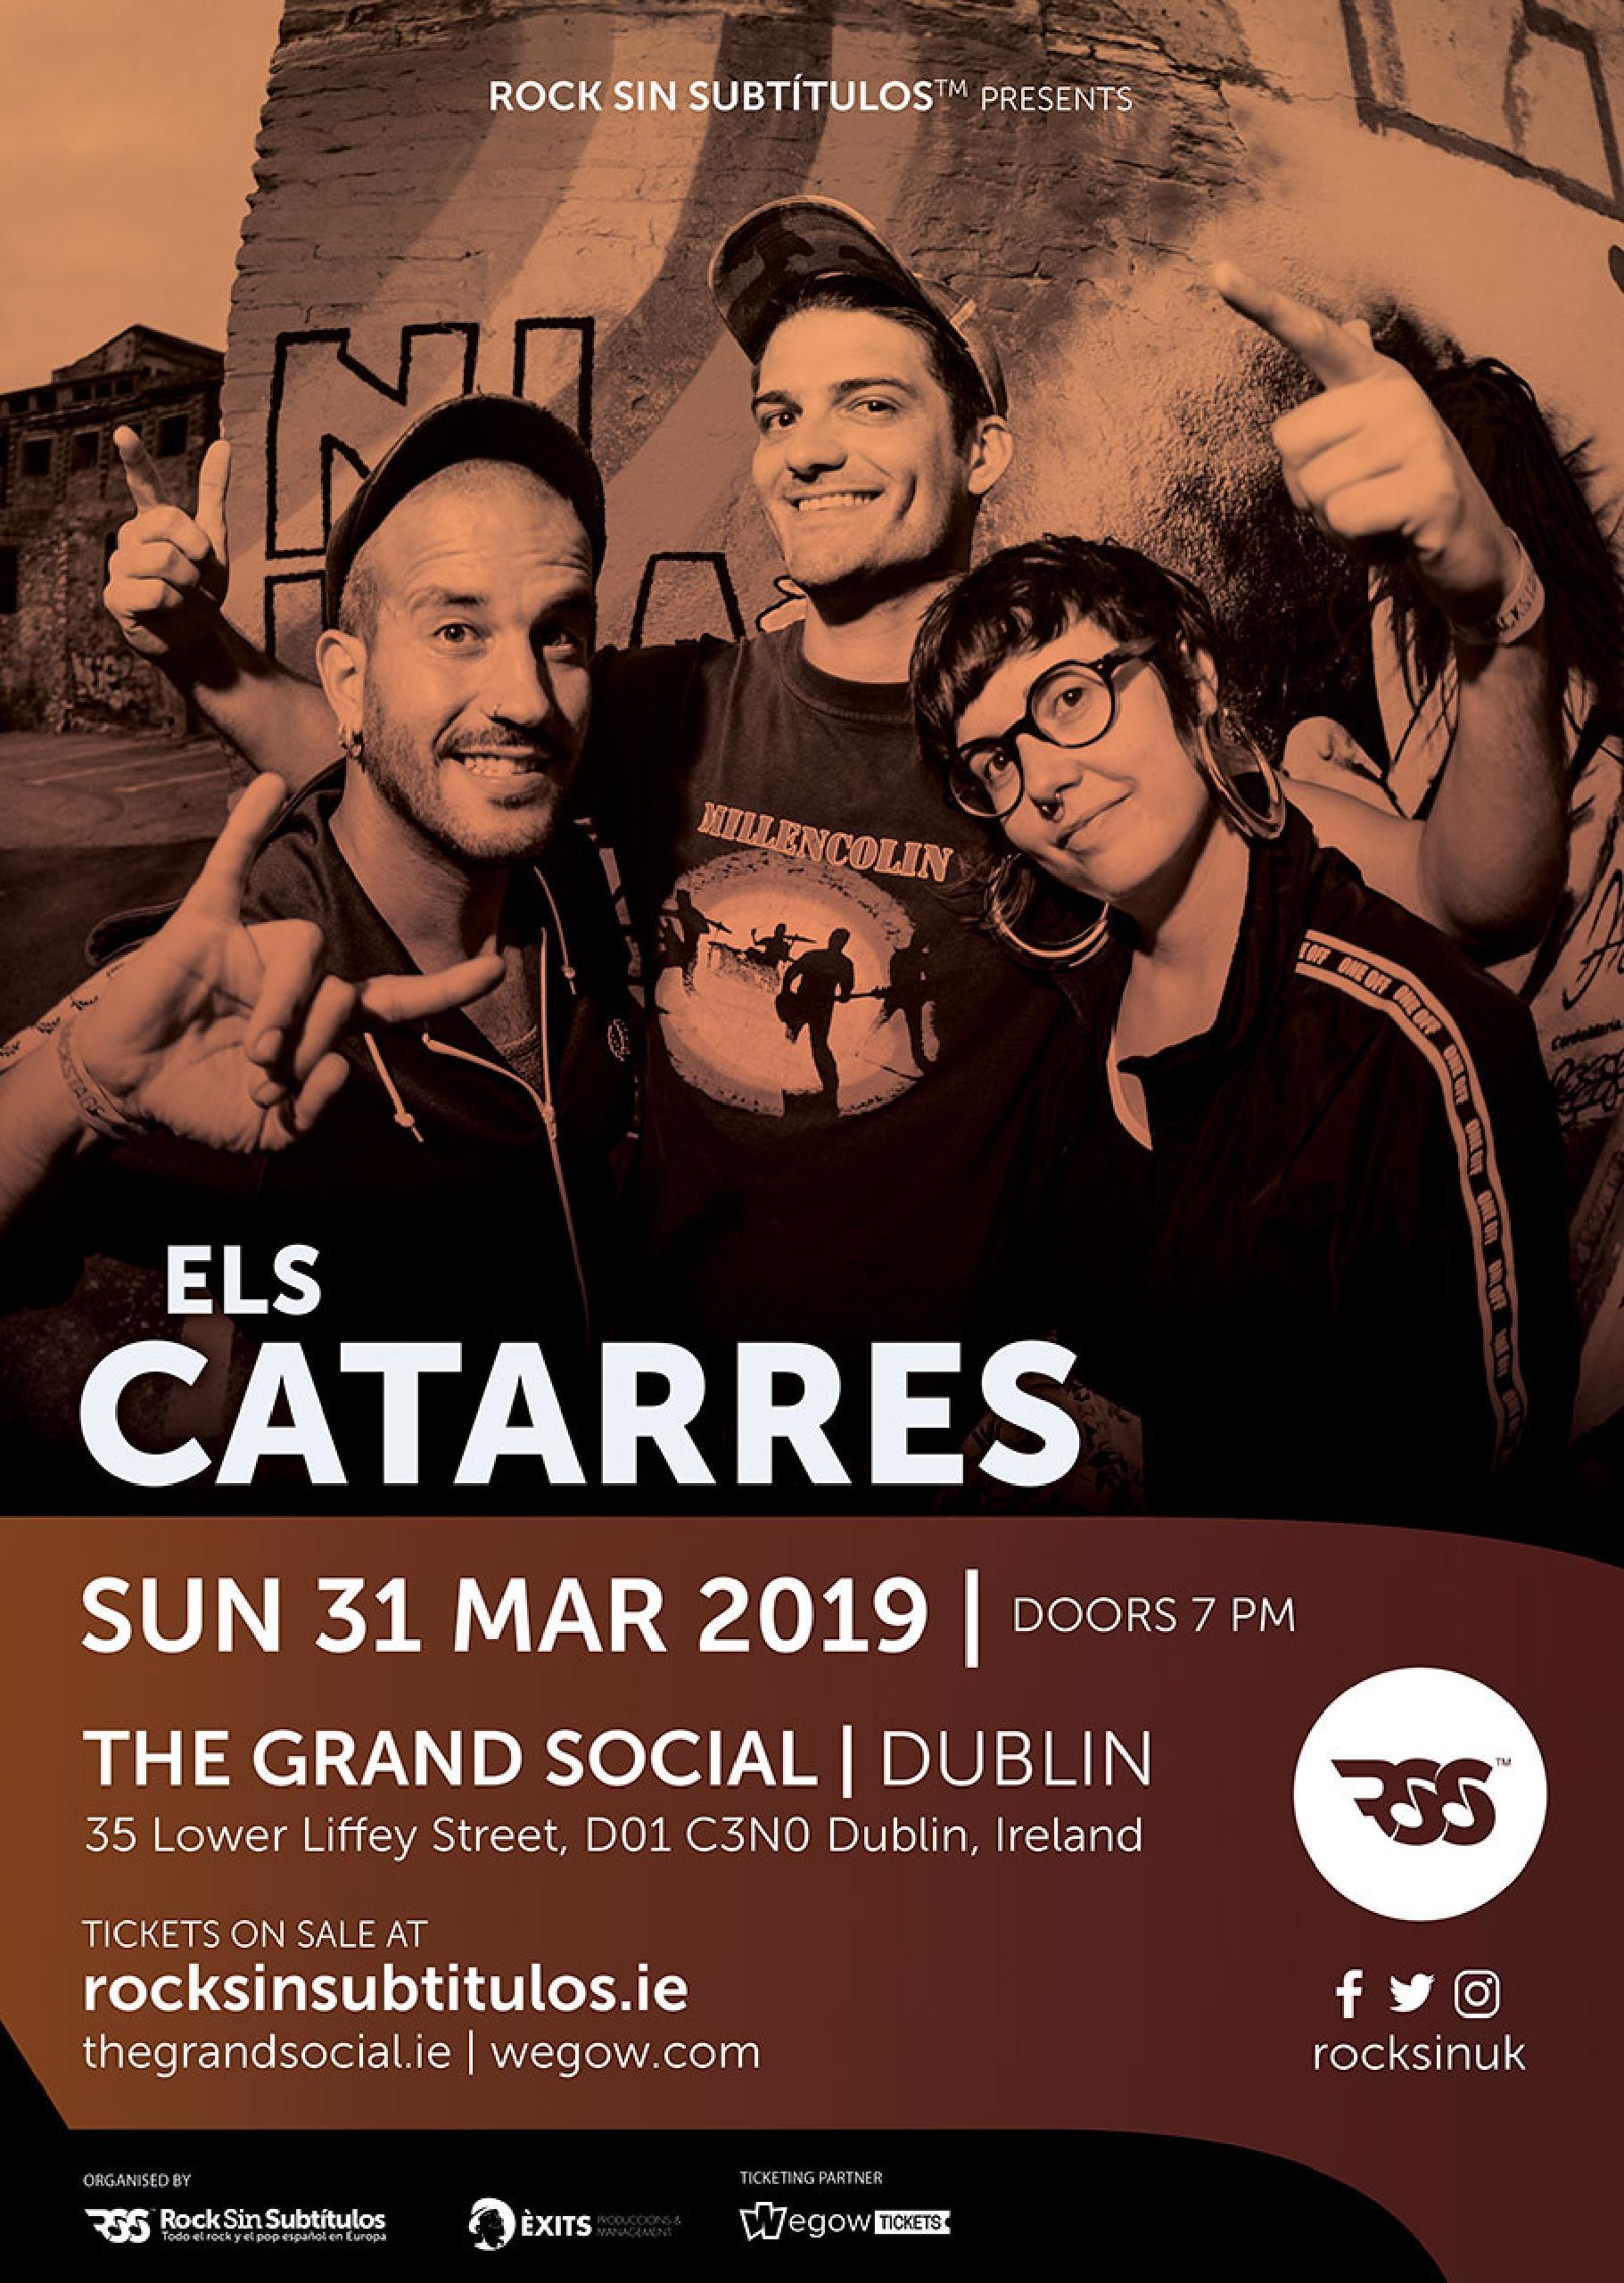 Domingo 31 marzo 2019 / 19 horas @ The Grand Social, Dublín